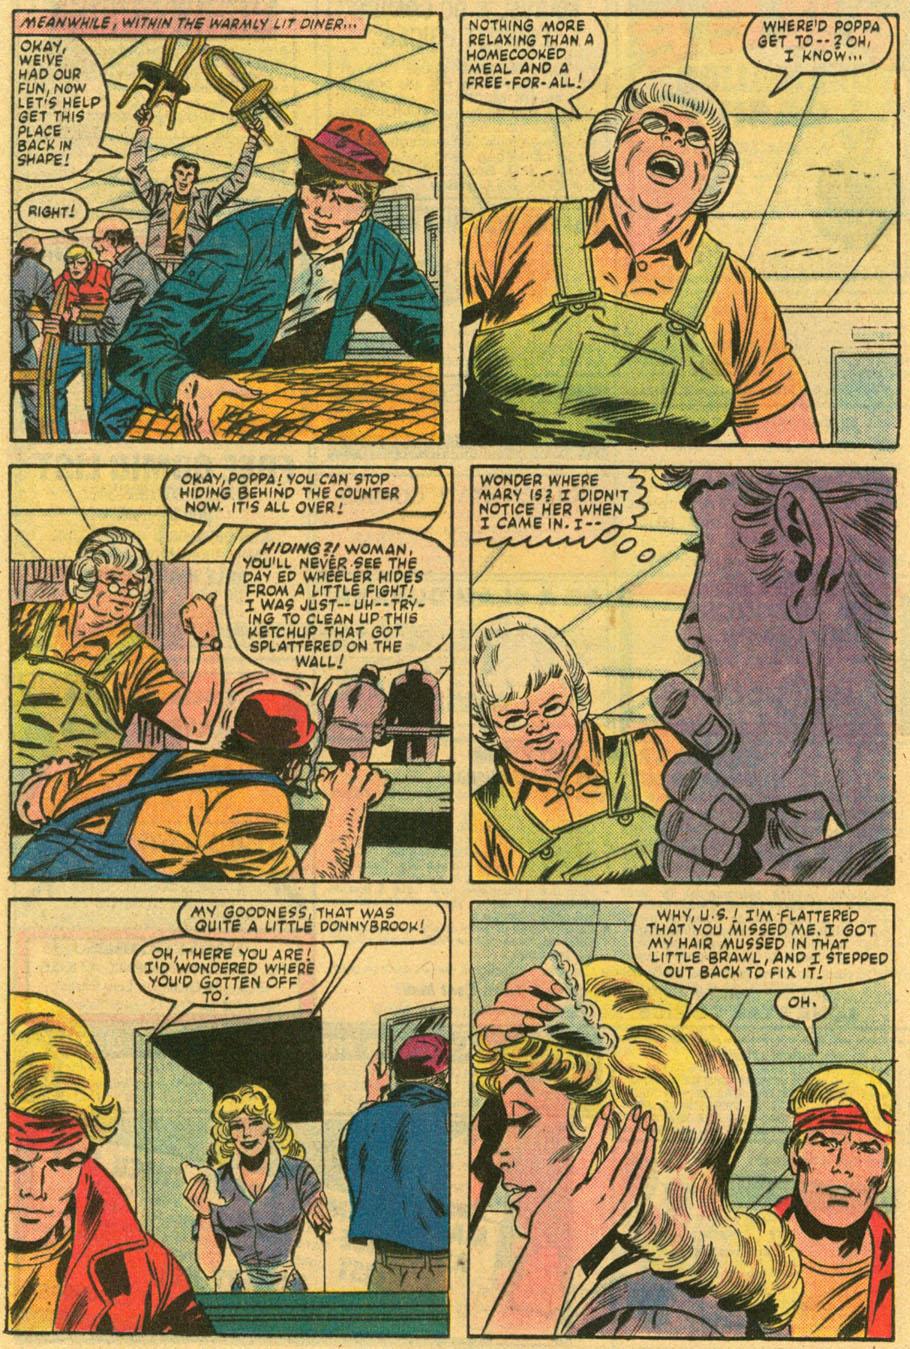 Read online U.S. 1 comic -  Issue #2 - 10